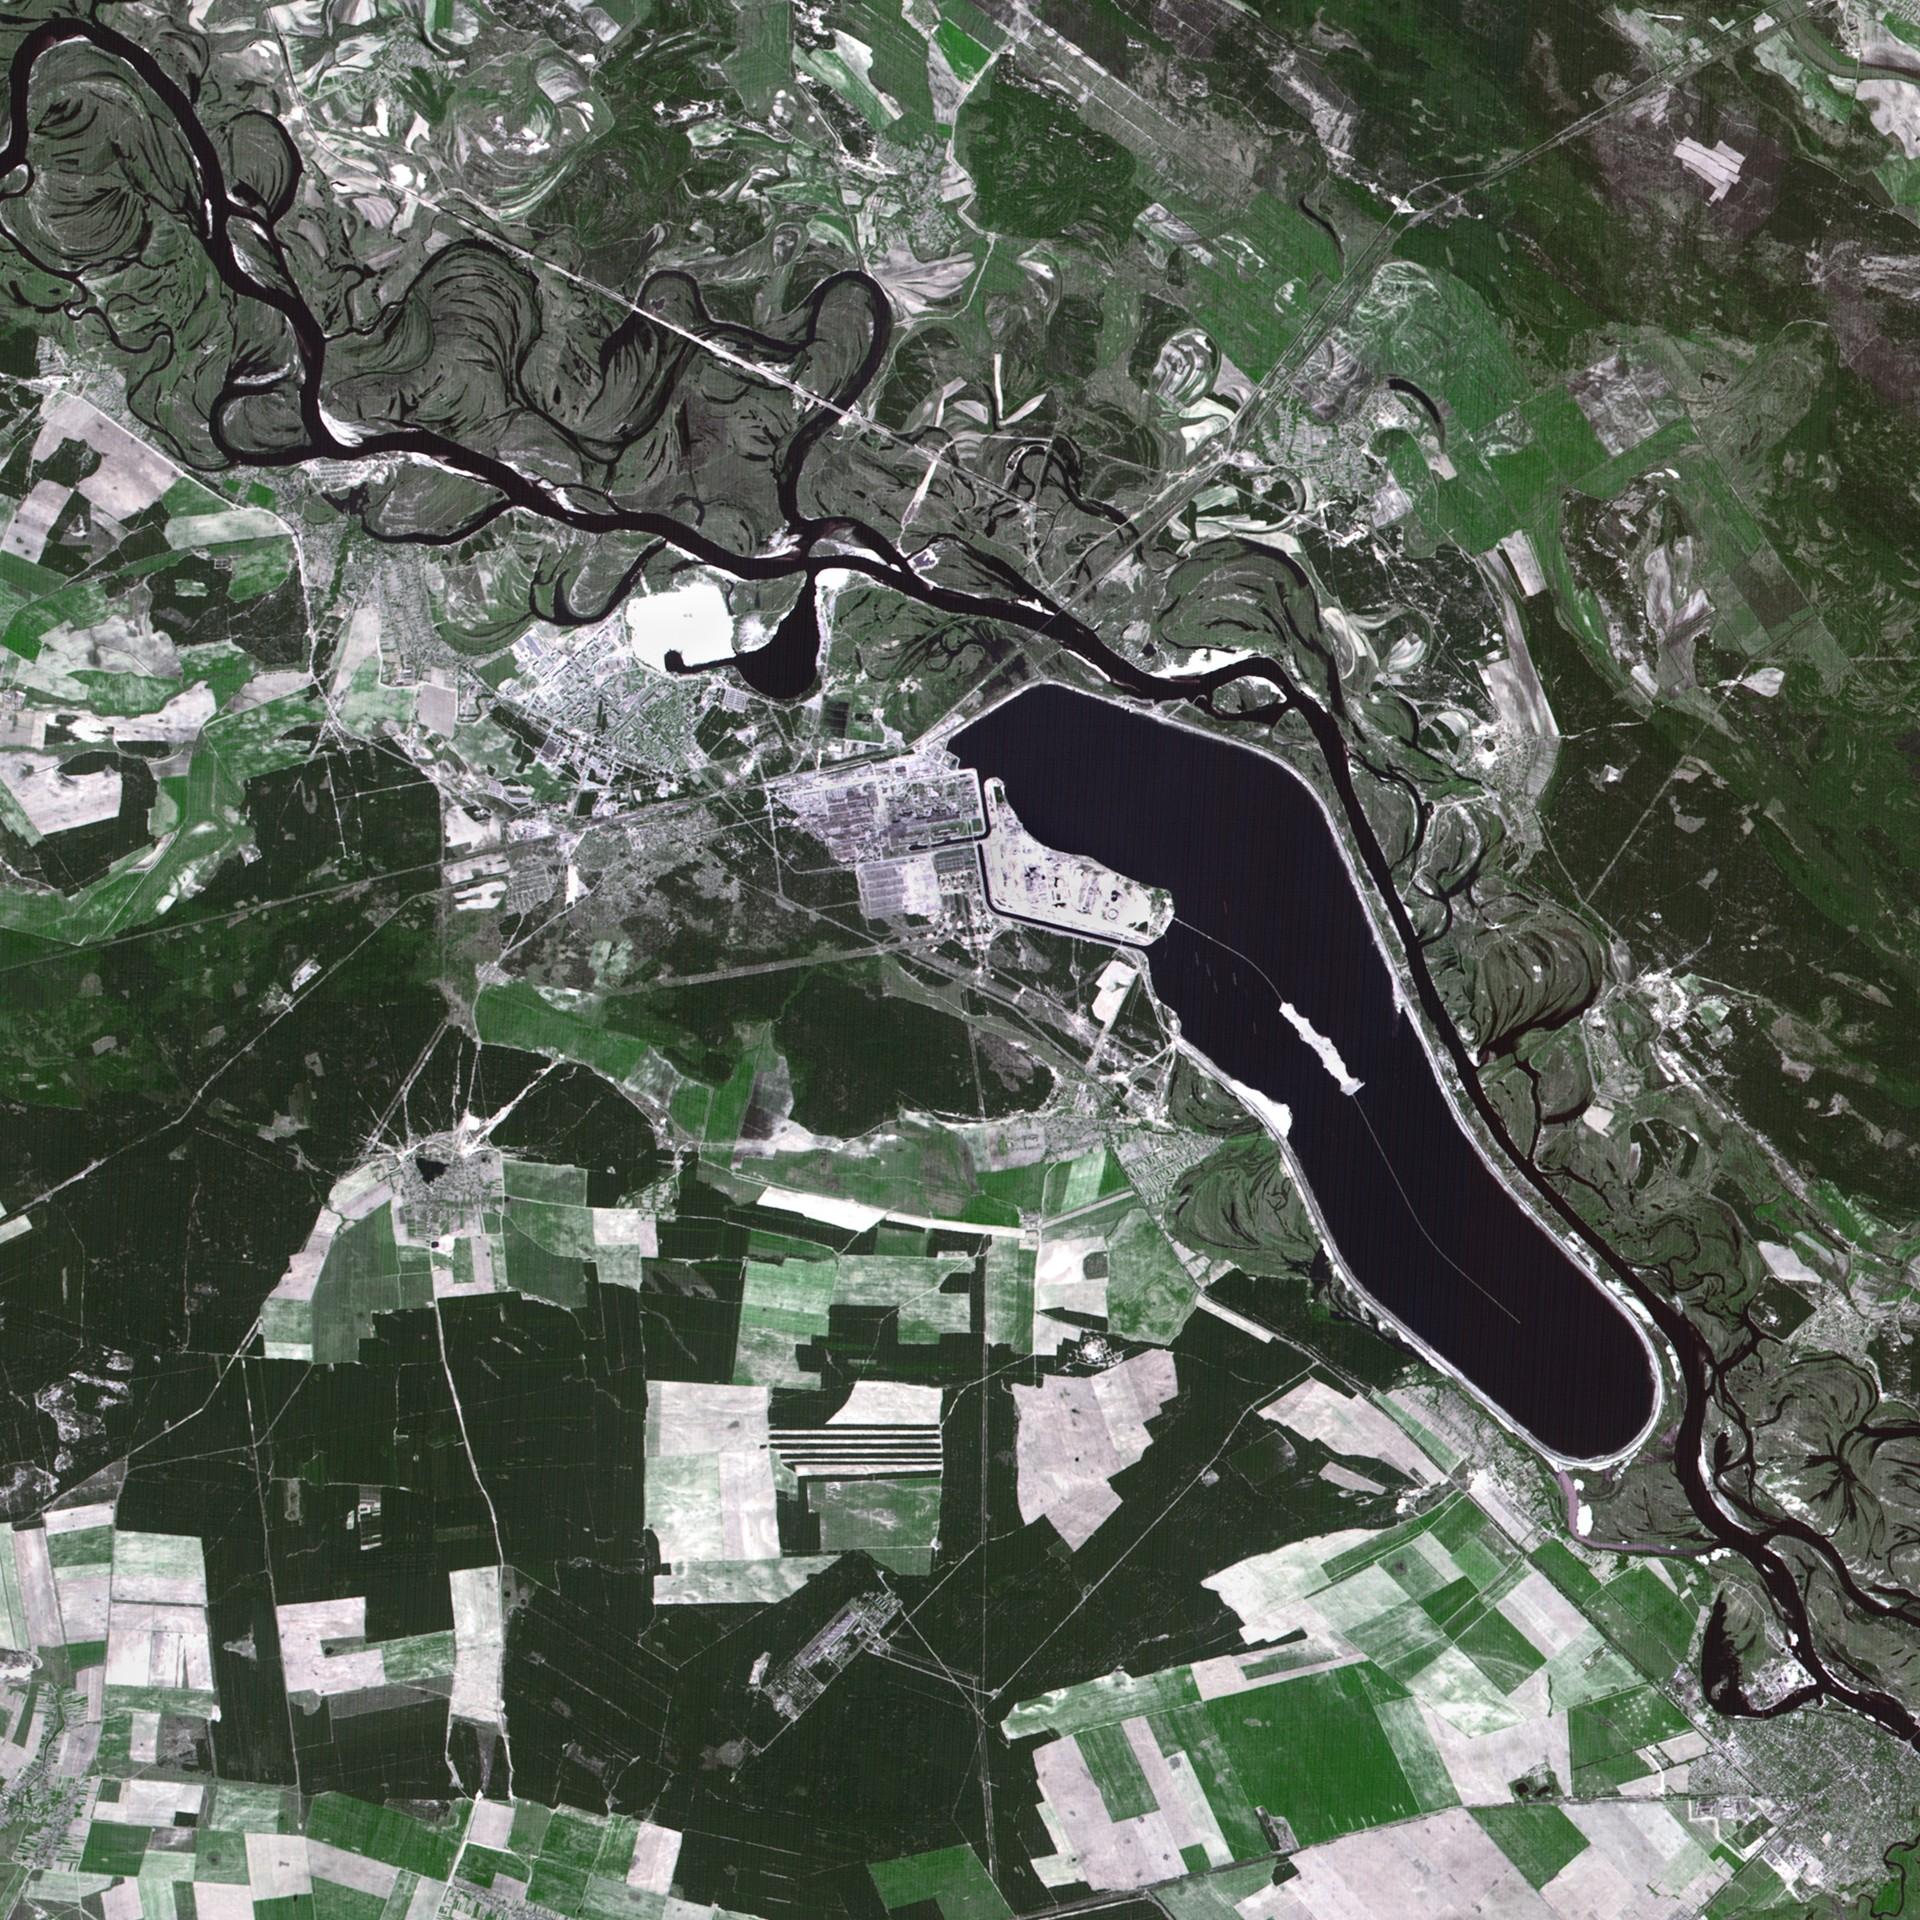 Tchernobyl - Chernobyl - Premières images satellites - explosion centrale - 26 avril 1986 - 7 mai 1986 - SPOT 1 - CNES - Spot Image - Airbus DS